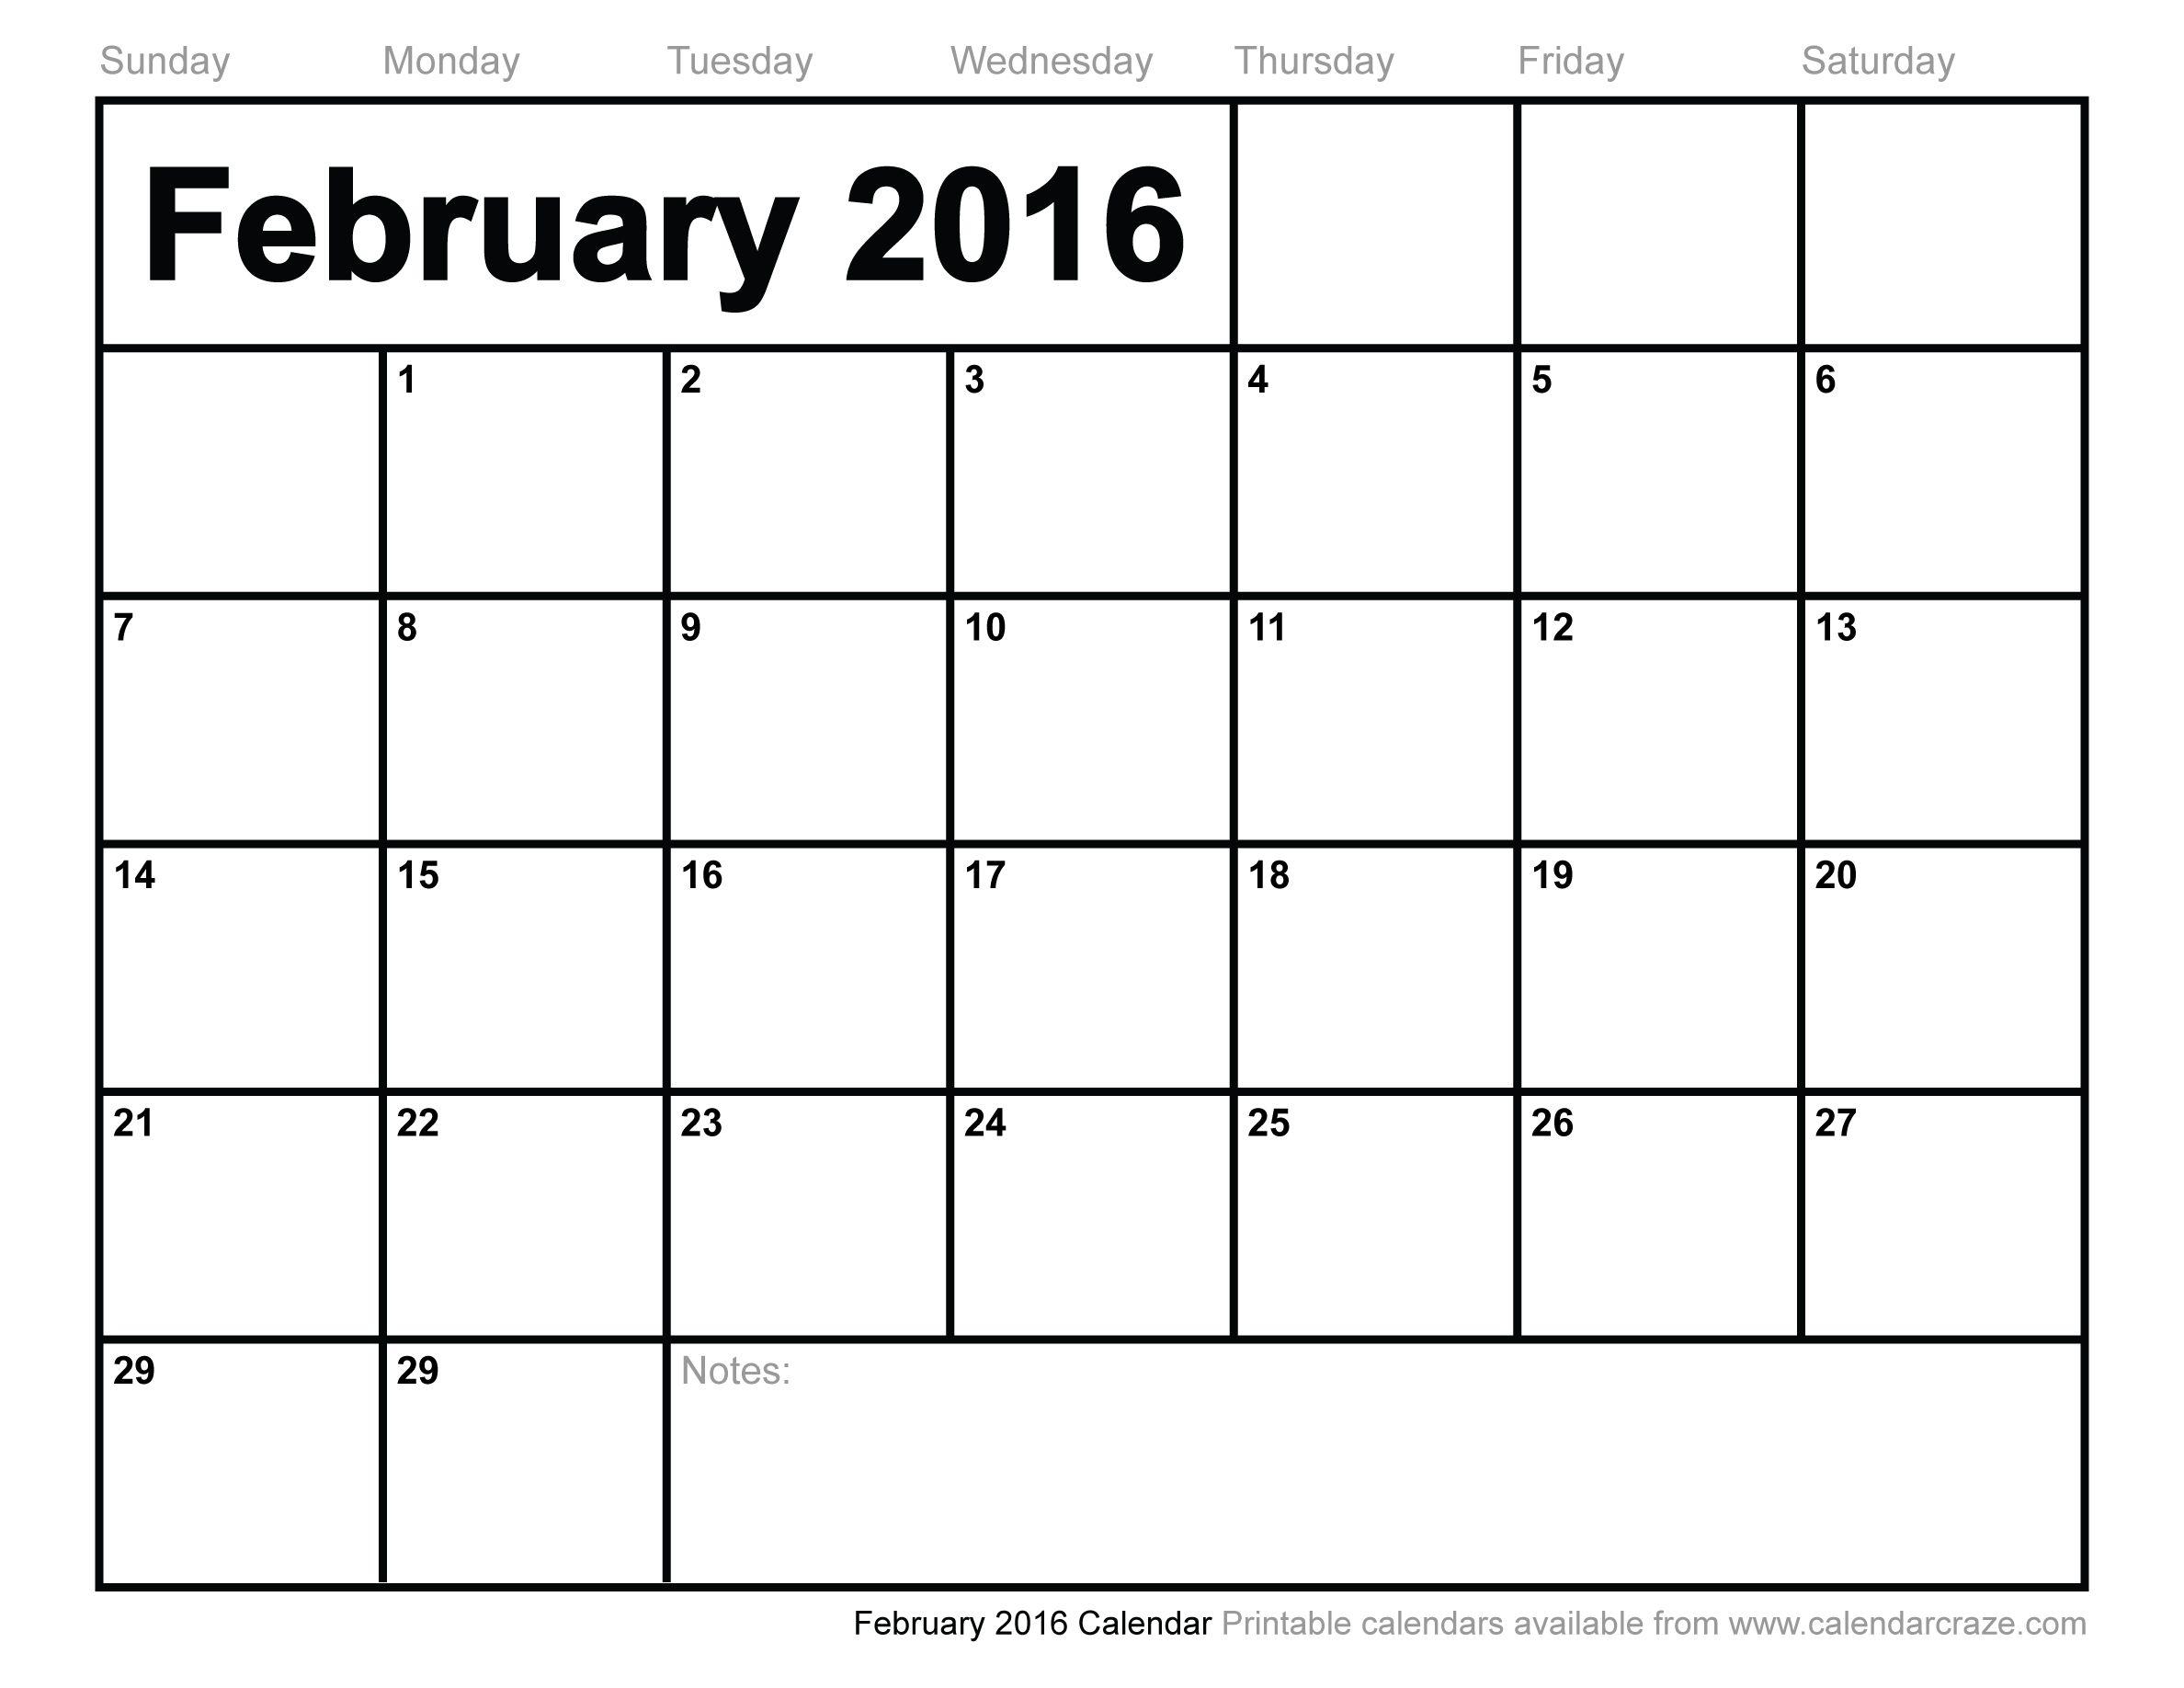 February 2016 Calendar 5th Friday Make A Life Saving Fashion